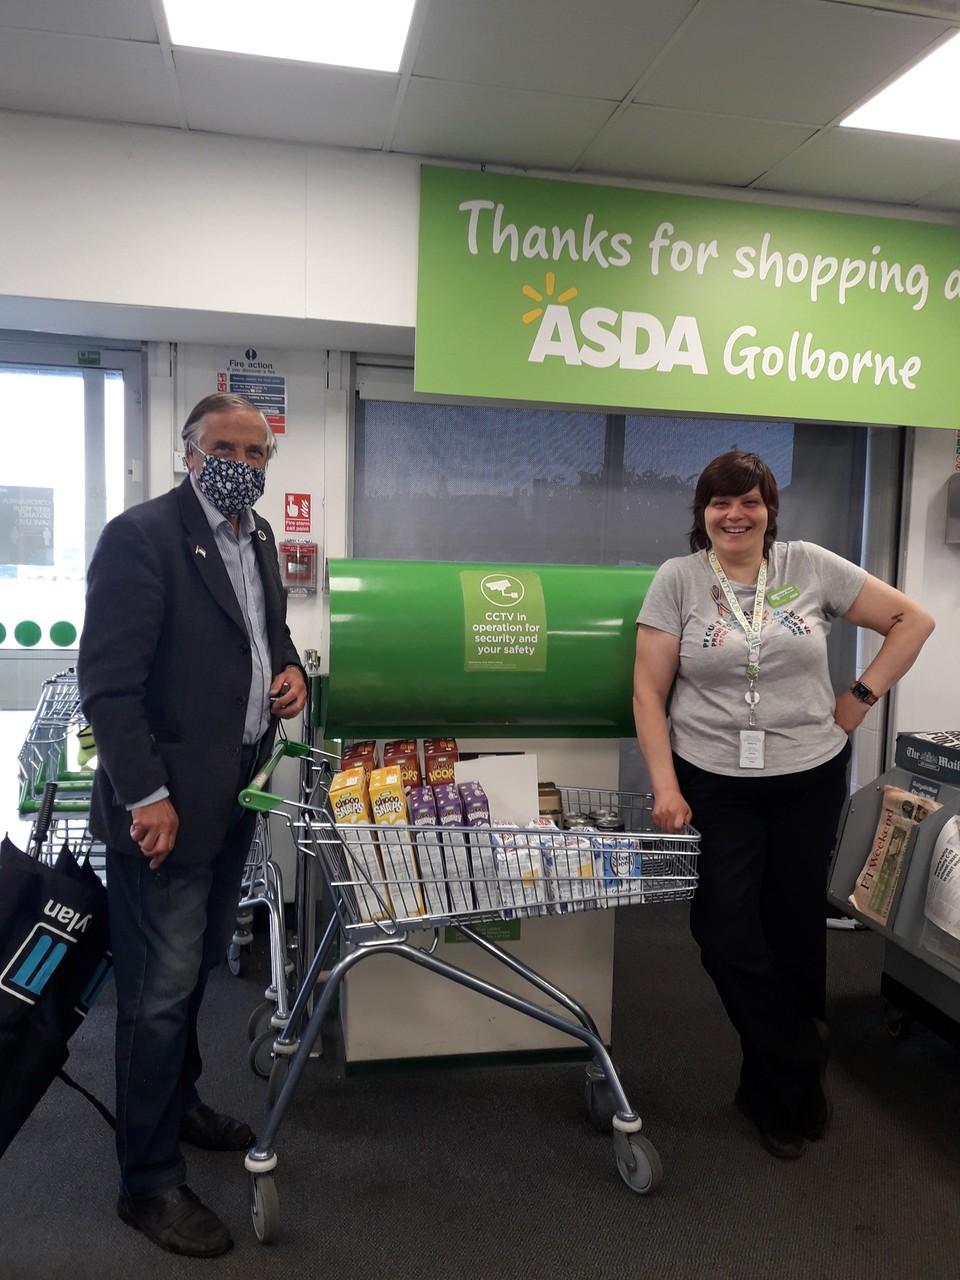 Donation to local foodbank | Asda Golborne